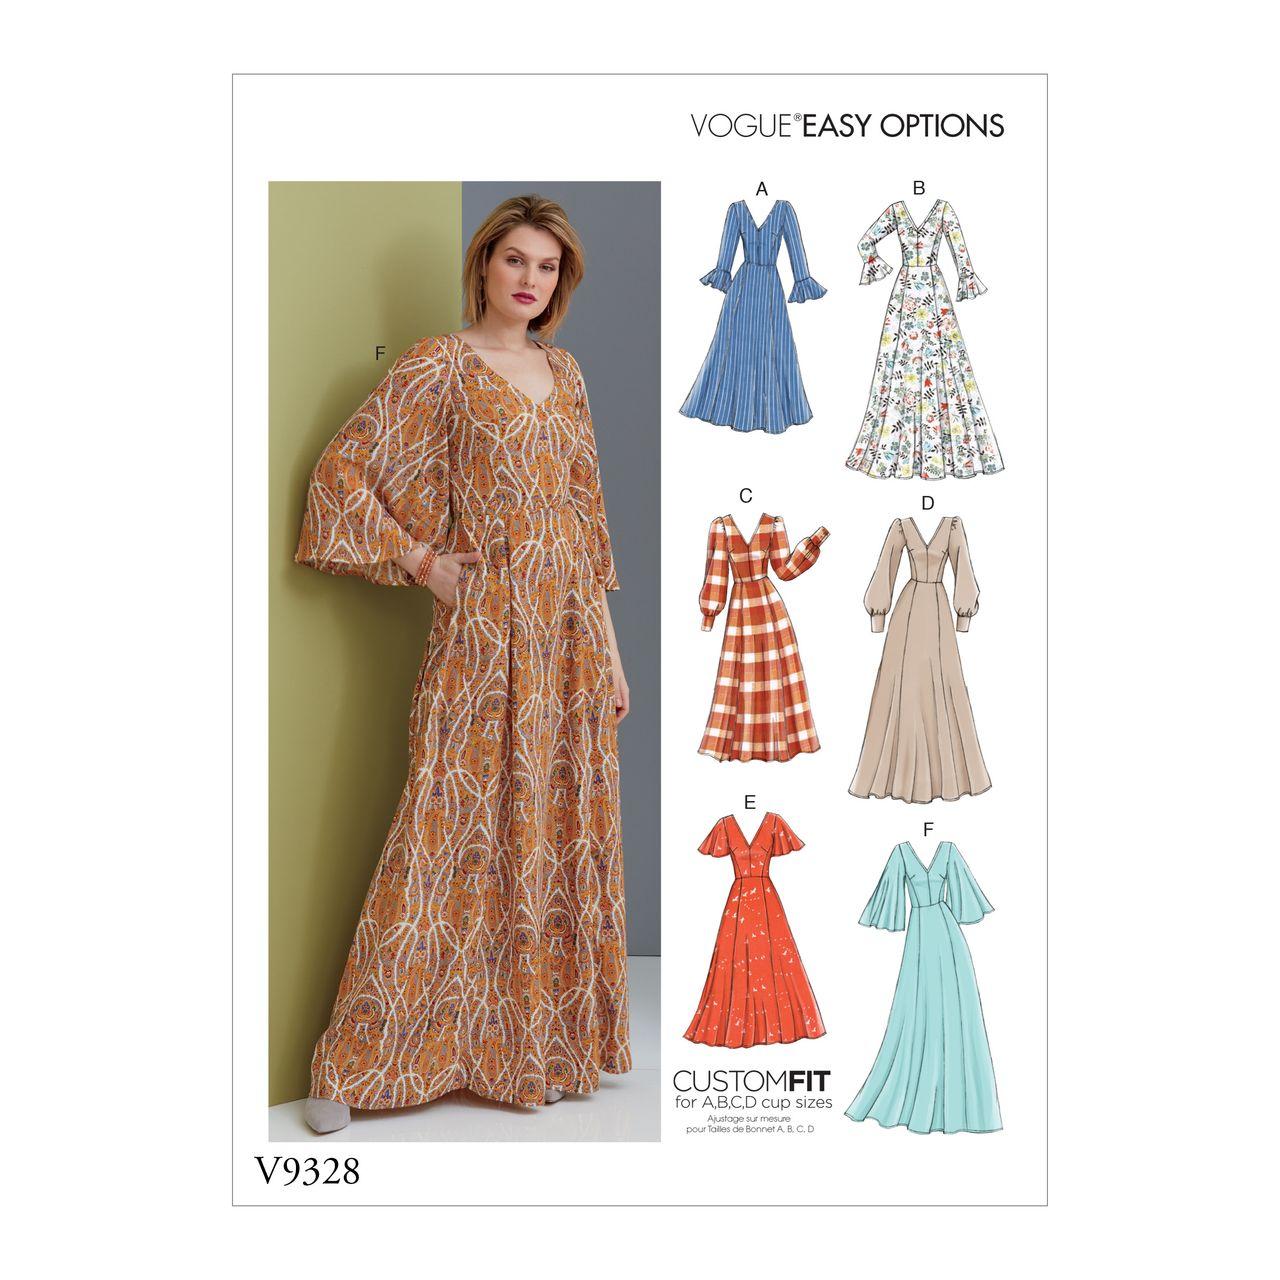 vogue schnittmuster v9328 - damen - kleid mit rundem rückenausschnitt |  alfatex webshop